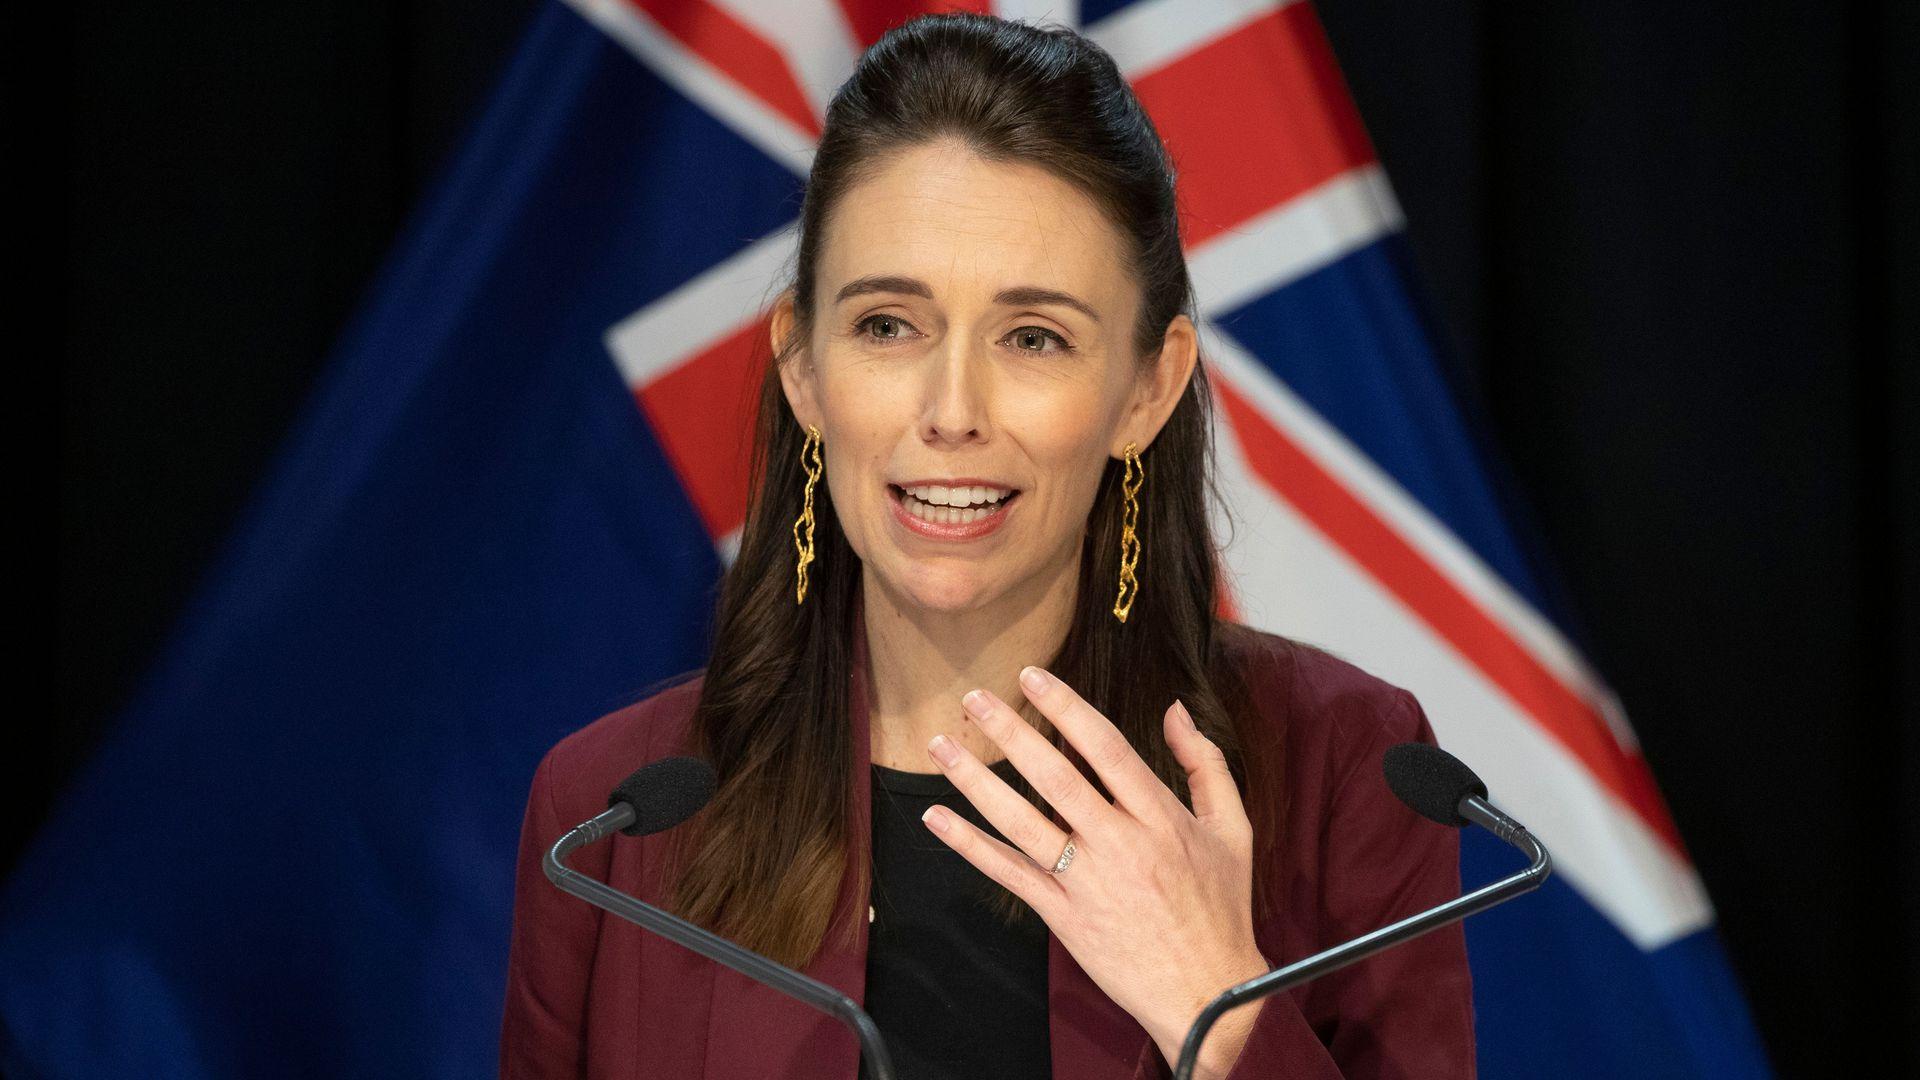 New Zealand Prime Minister, Jacinda Arden